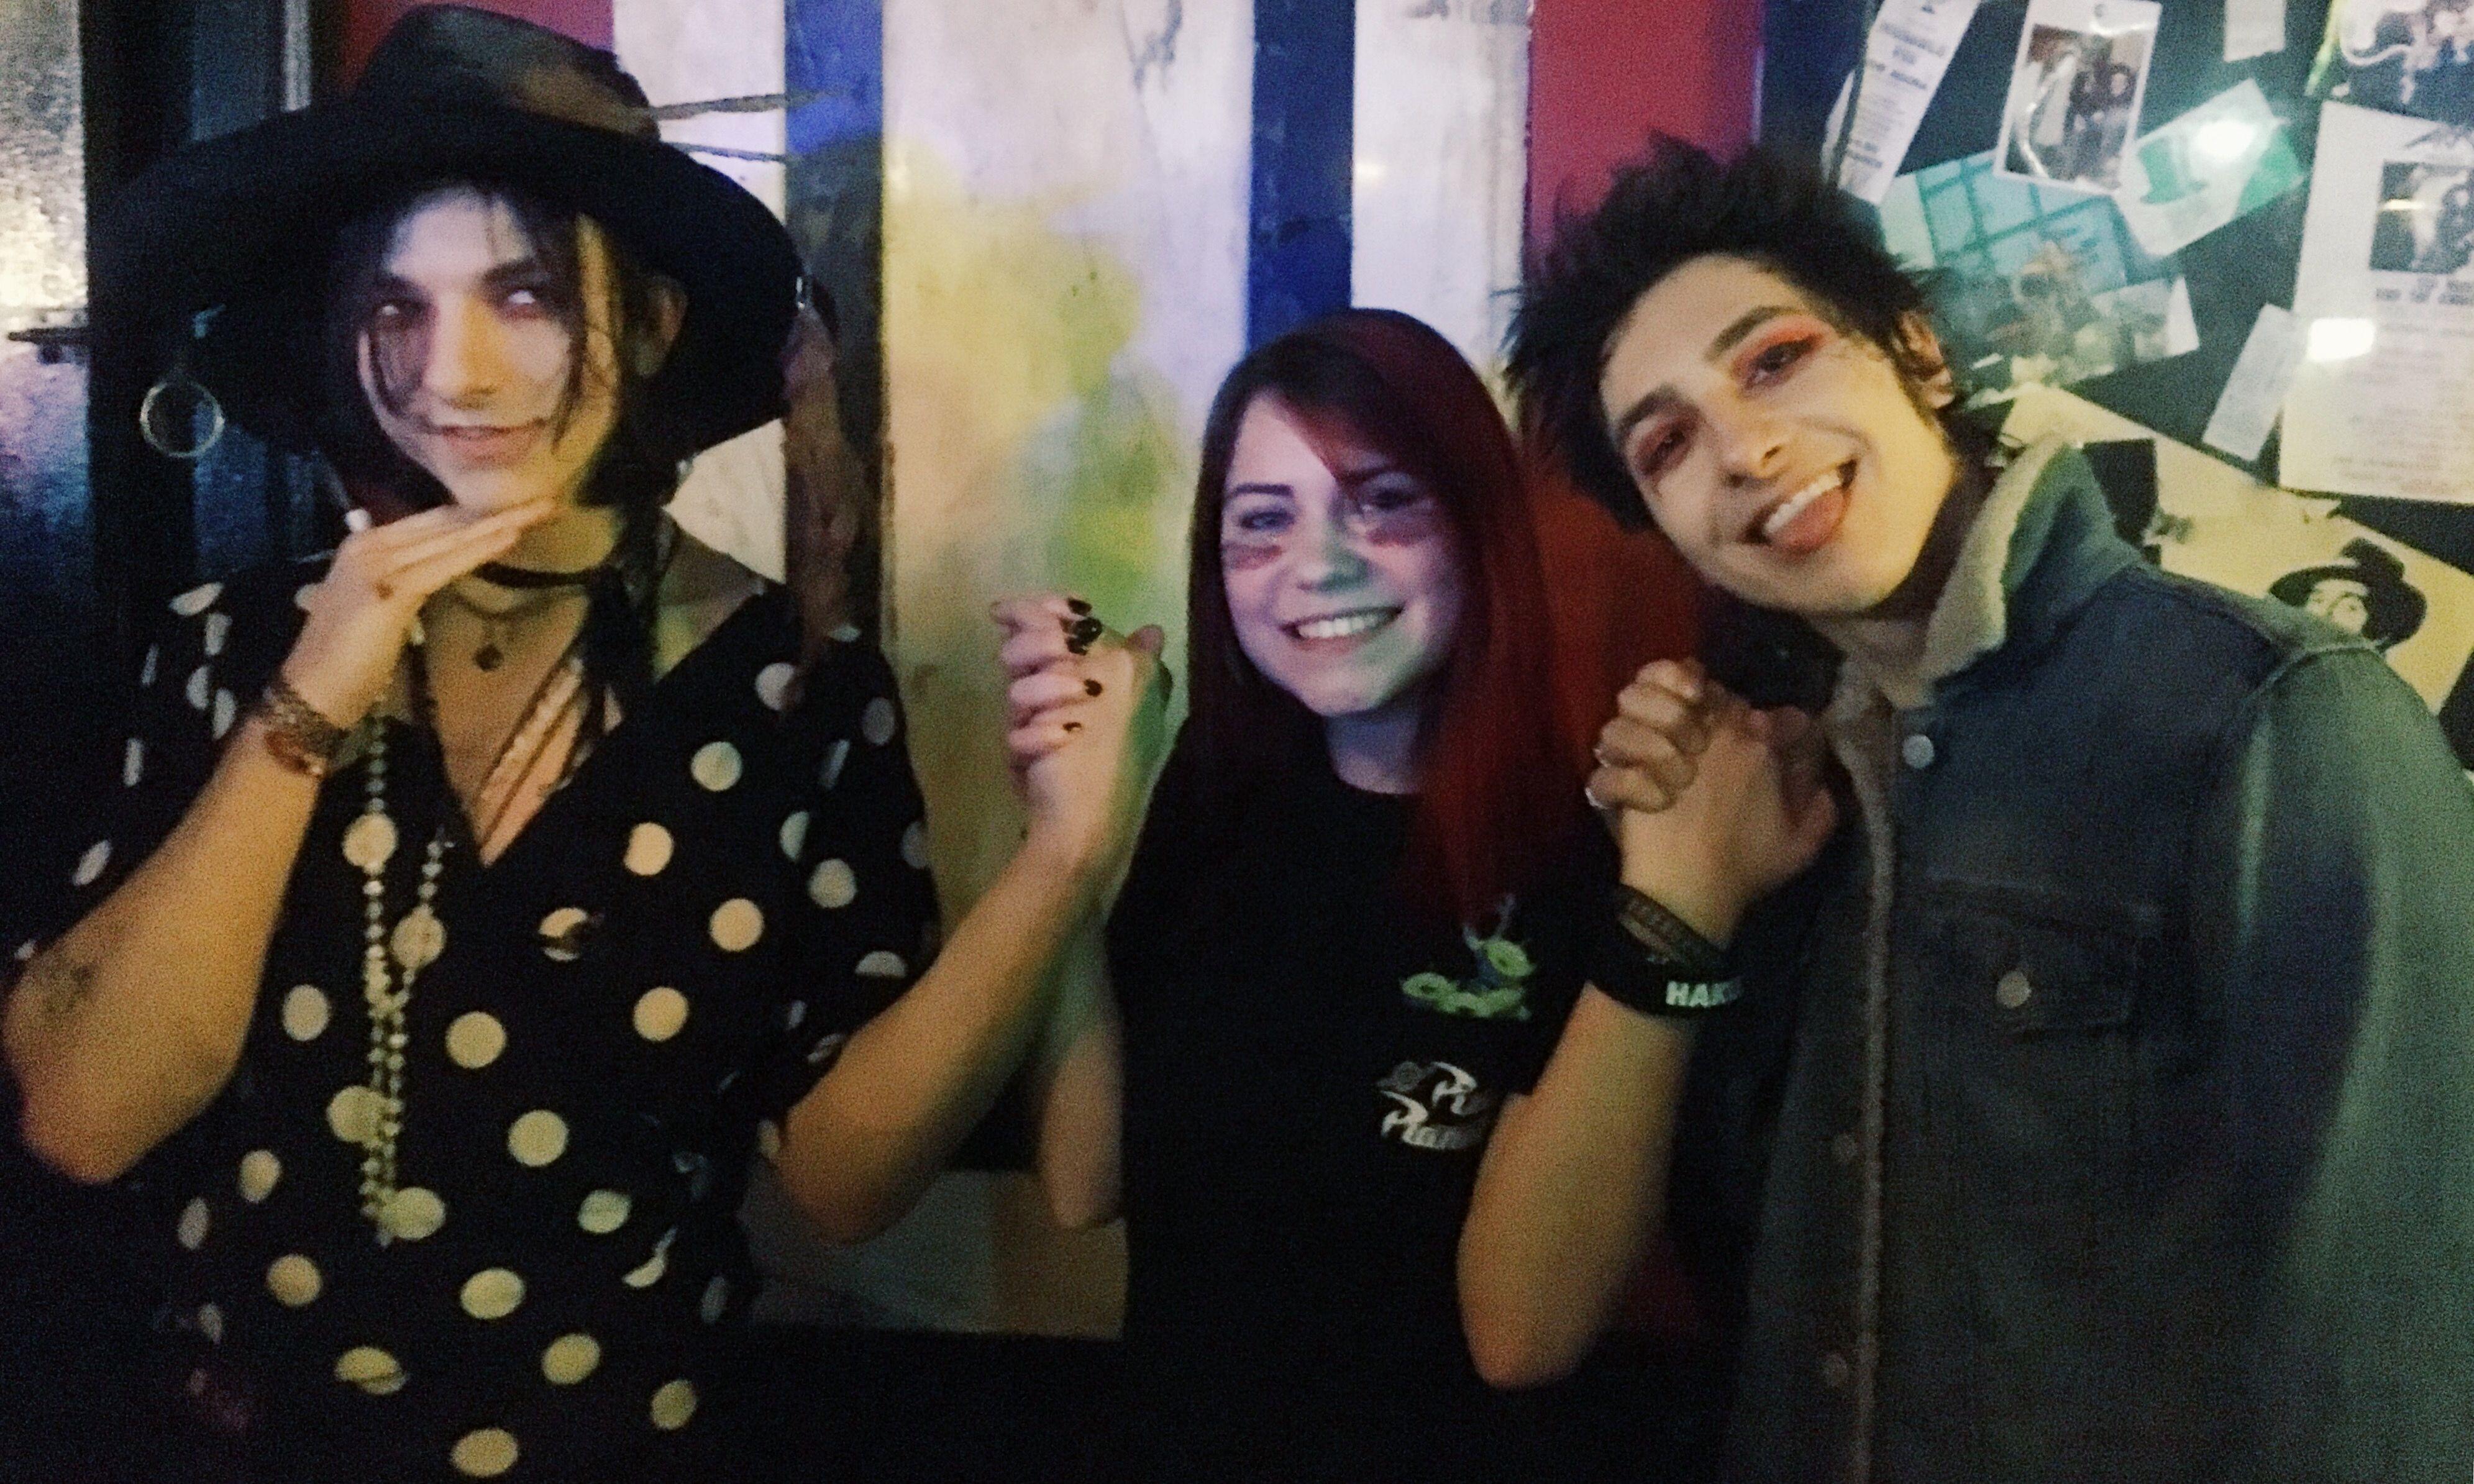 Palaye Royale Meet And Greet Bands Pinterest